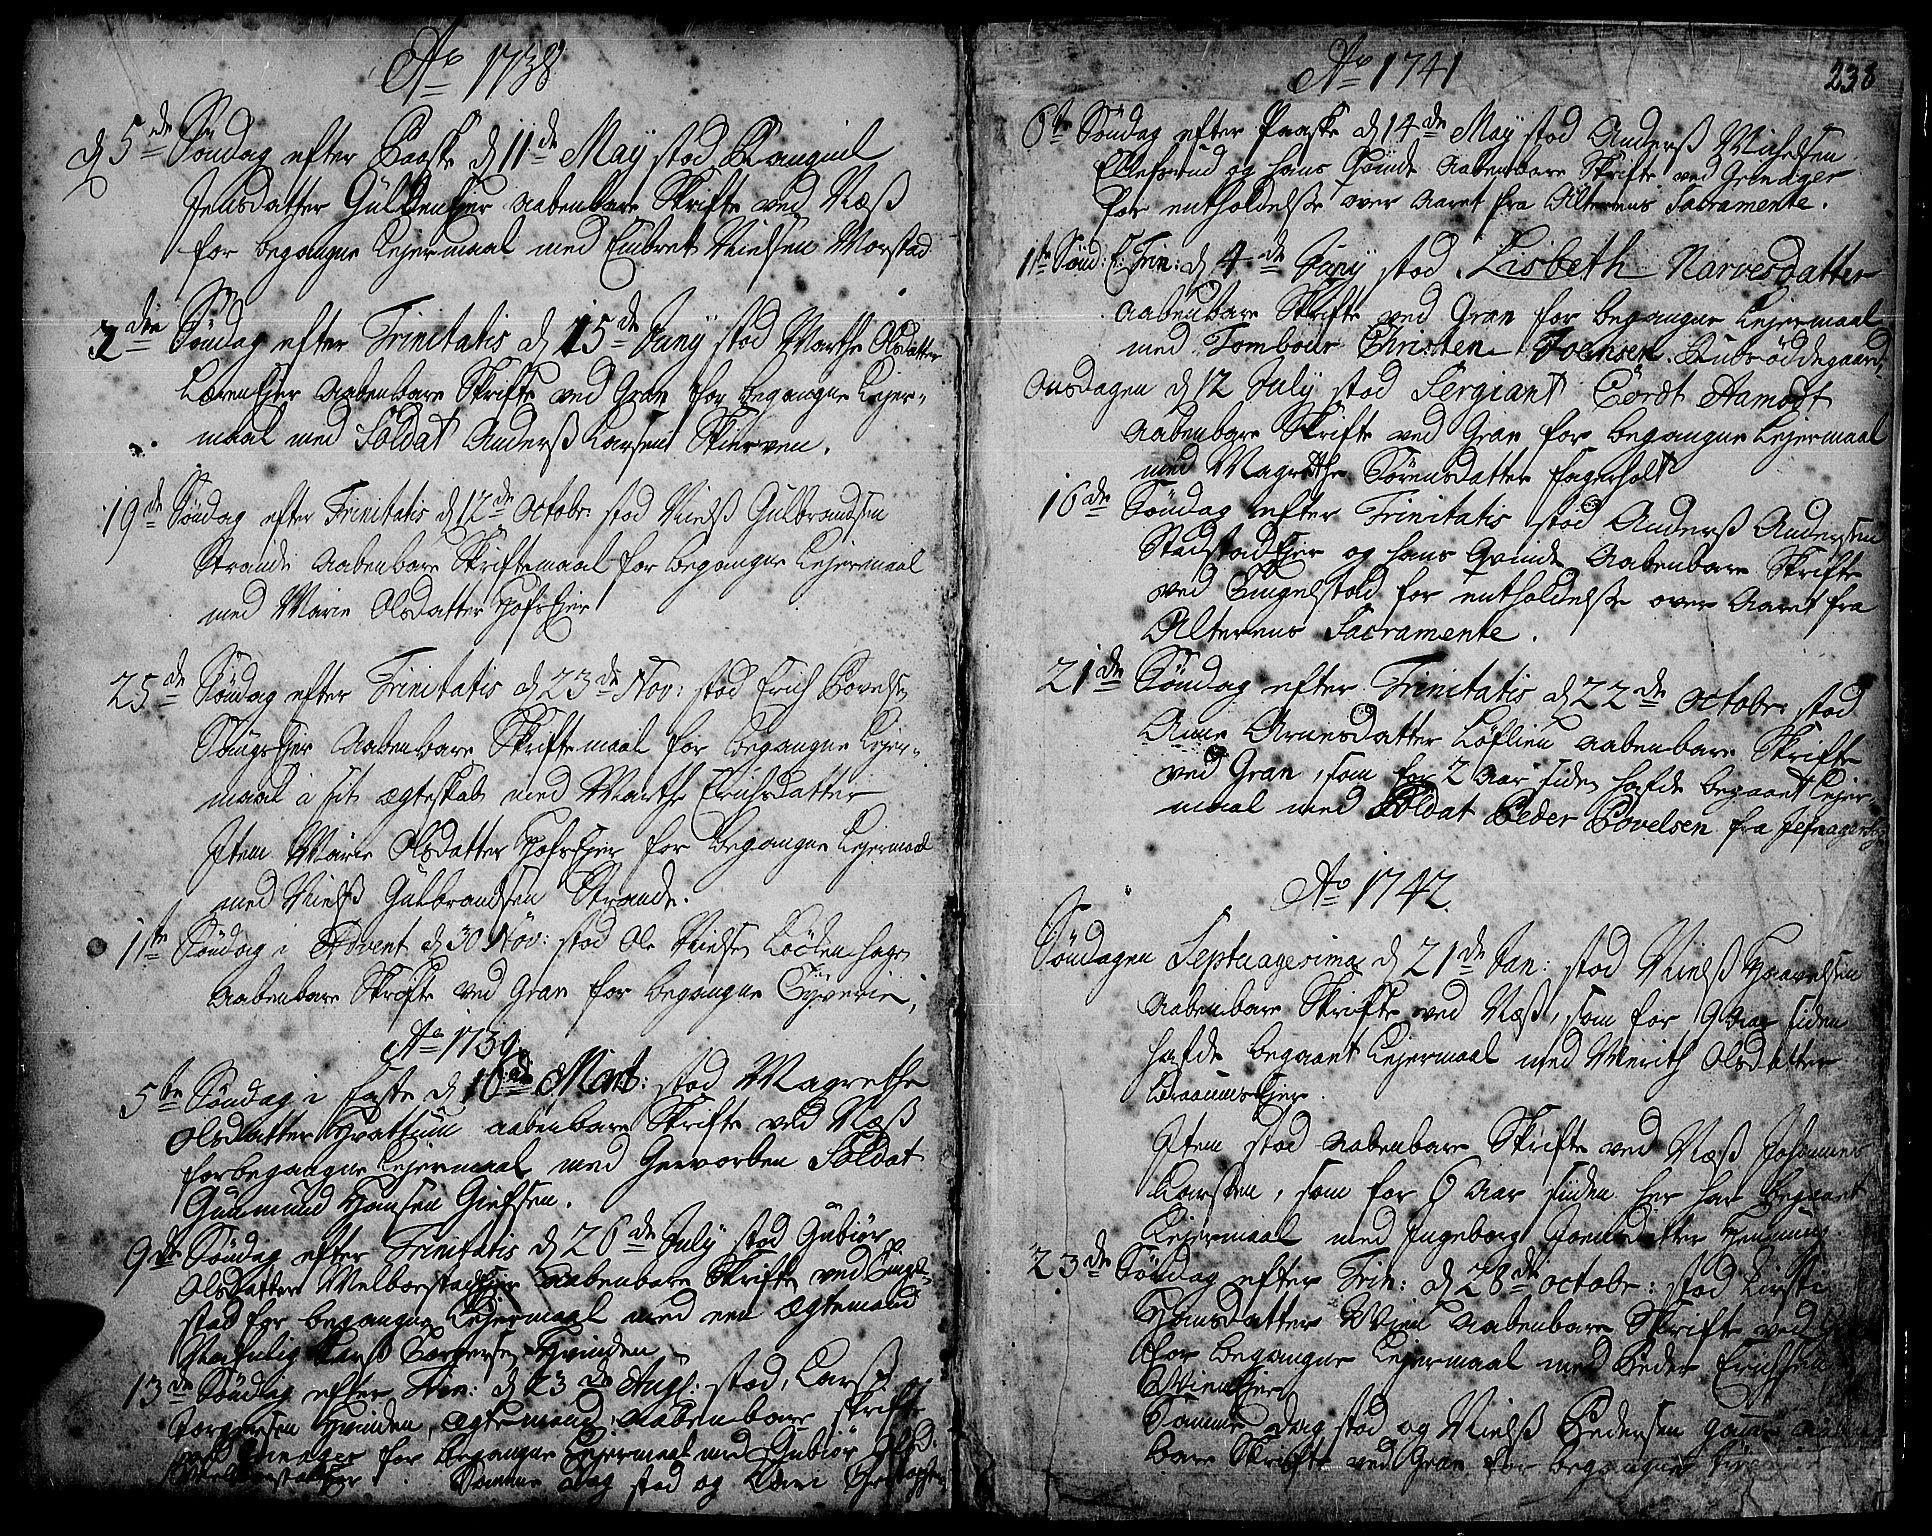 SAH, Gran prestekontor, Ministerialbok nr. 2, 1732-1744, s. 238